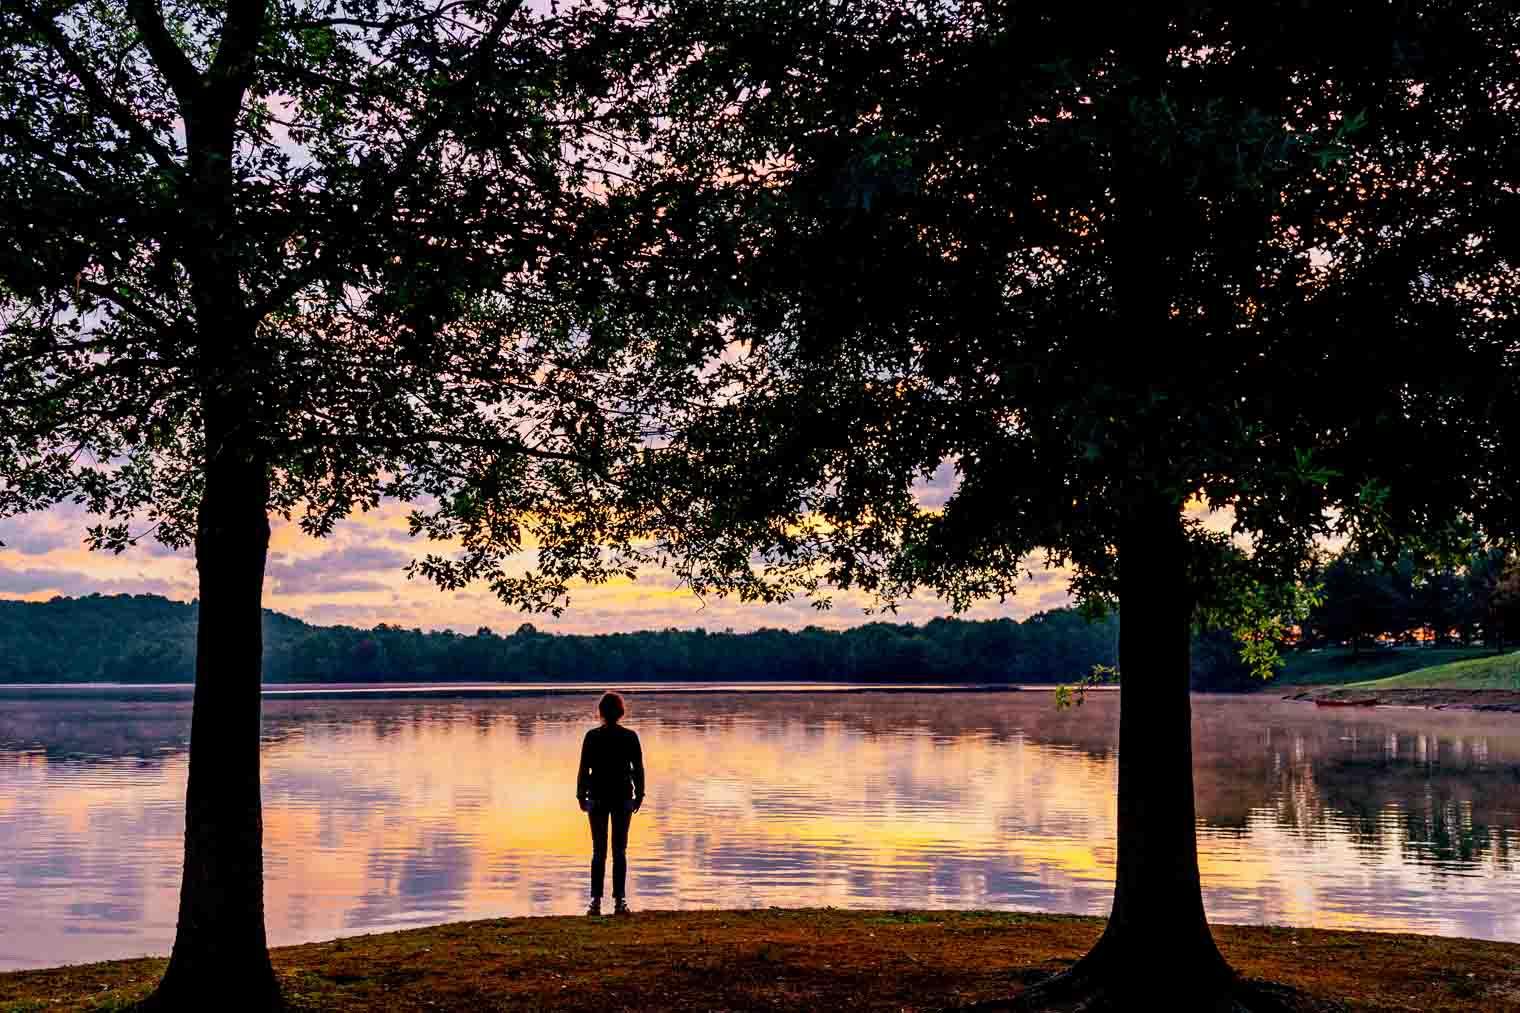 Sunrise at Summersville Lake in West Virginia